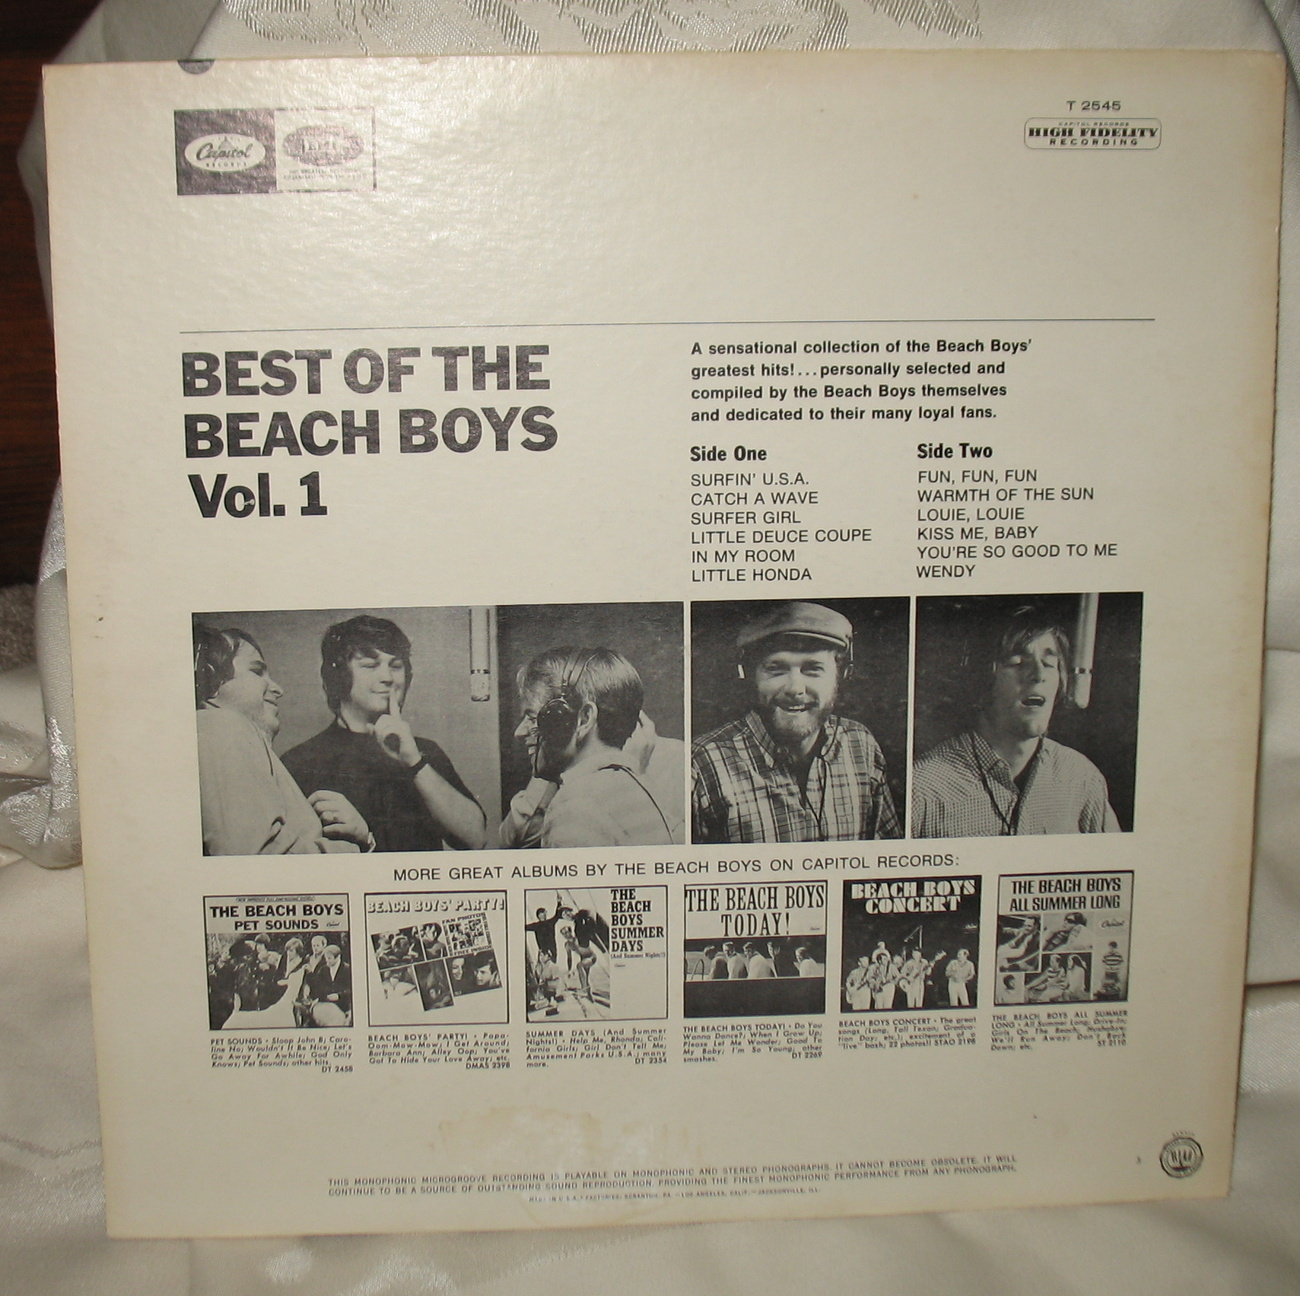 Best of the Beach Boys High Fidelity T2545 Surfin' U.S.A.